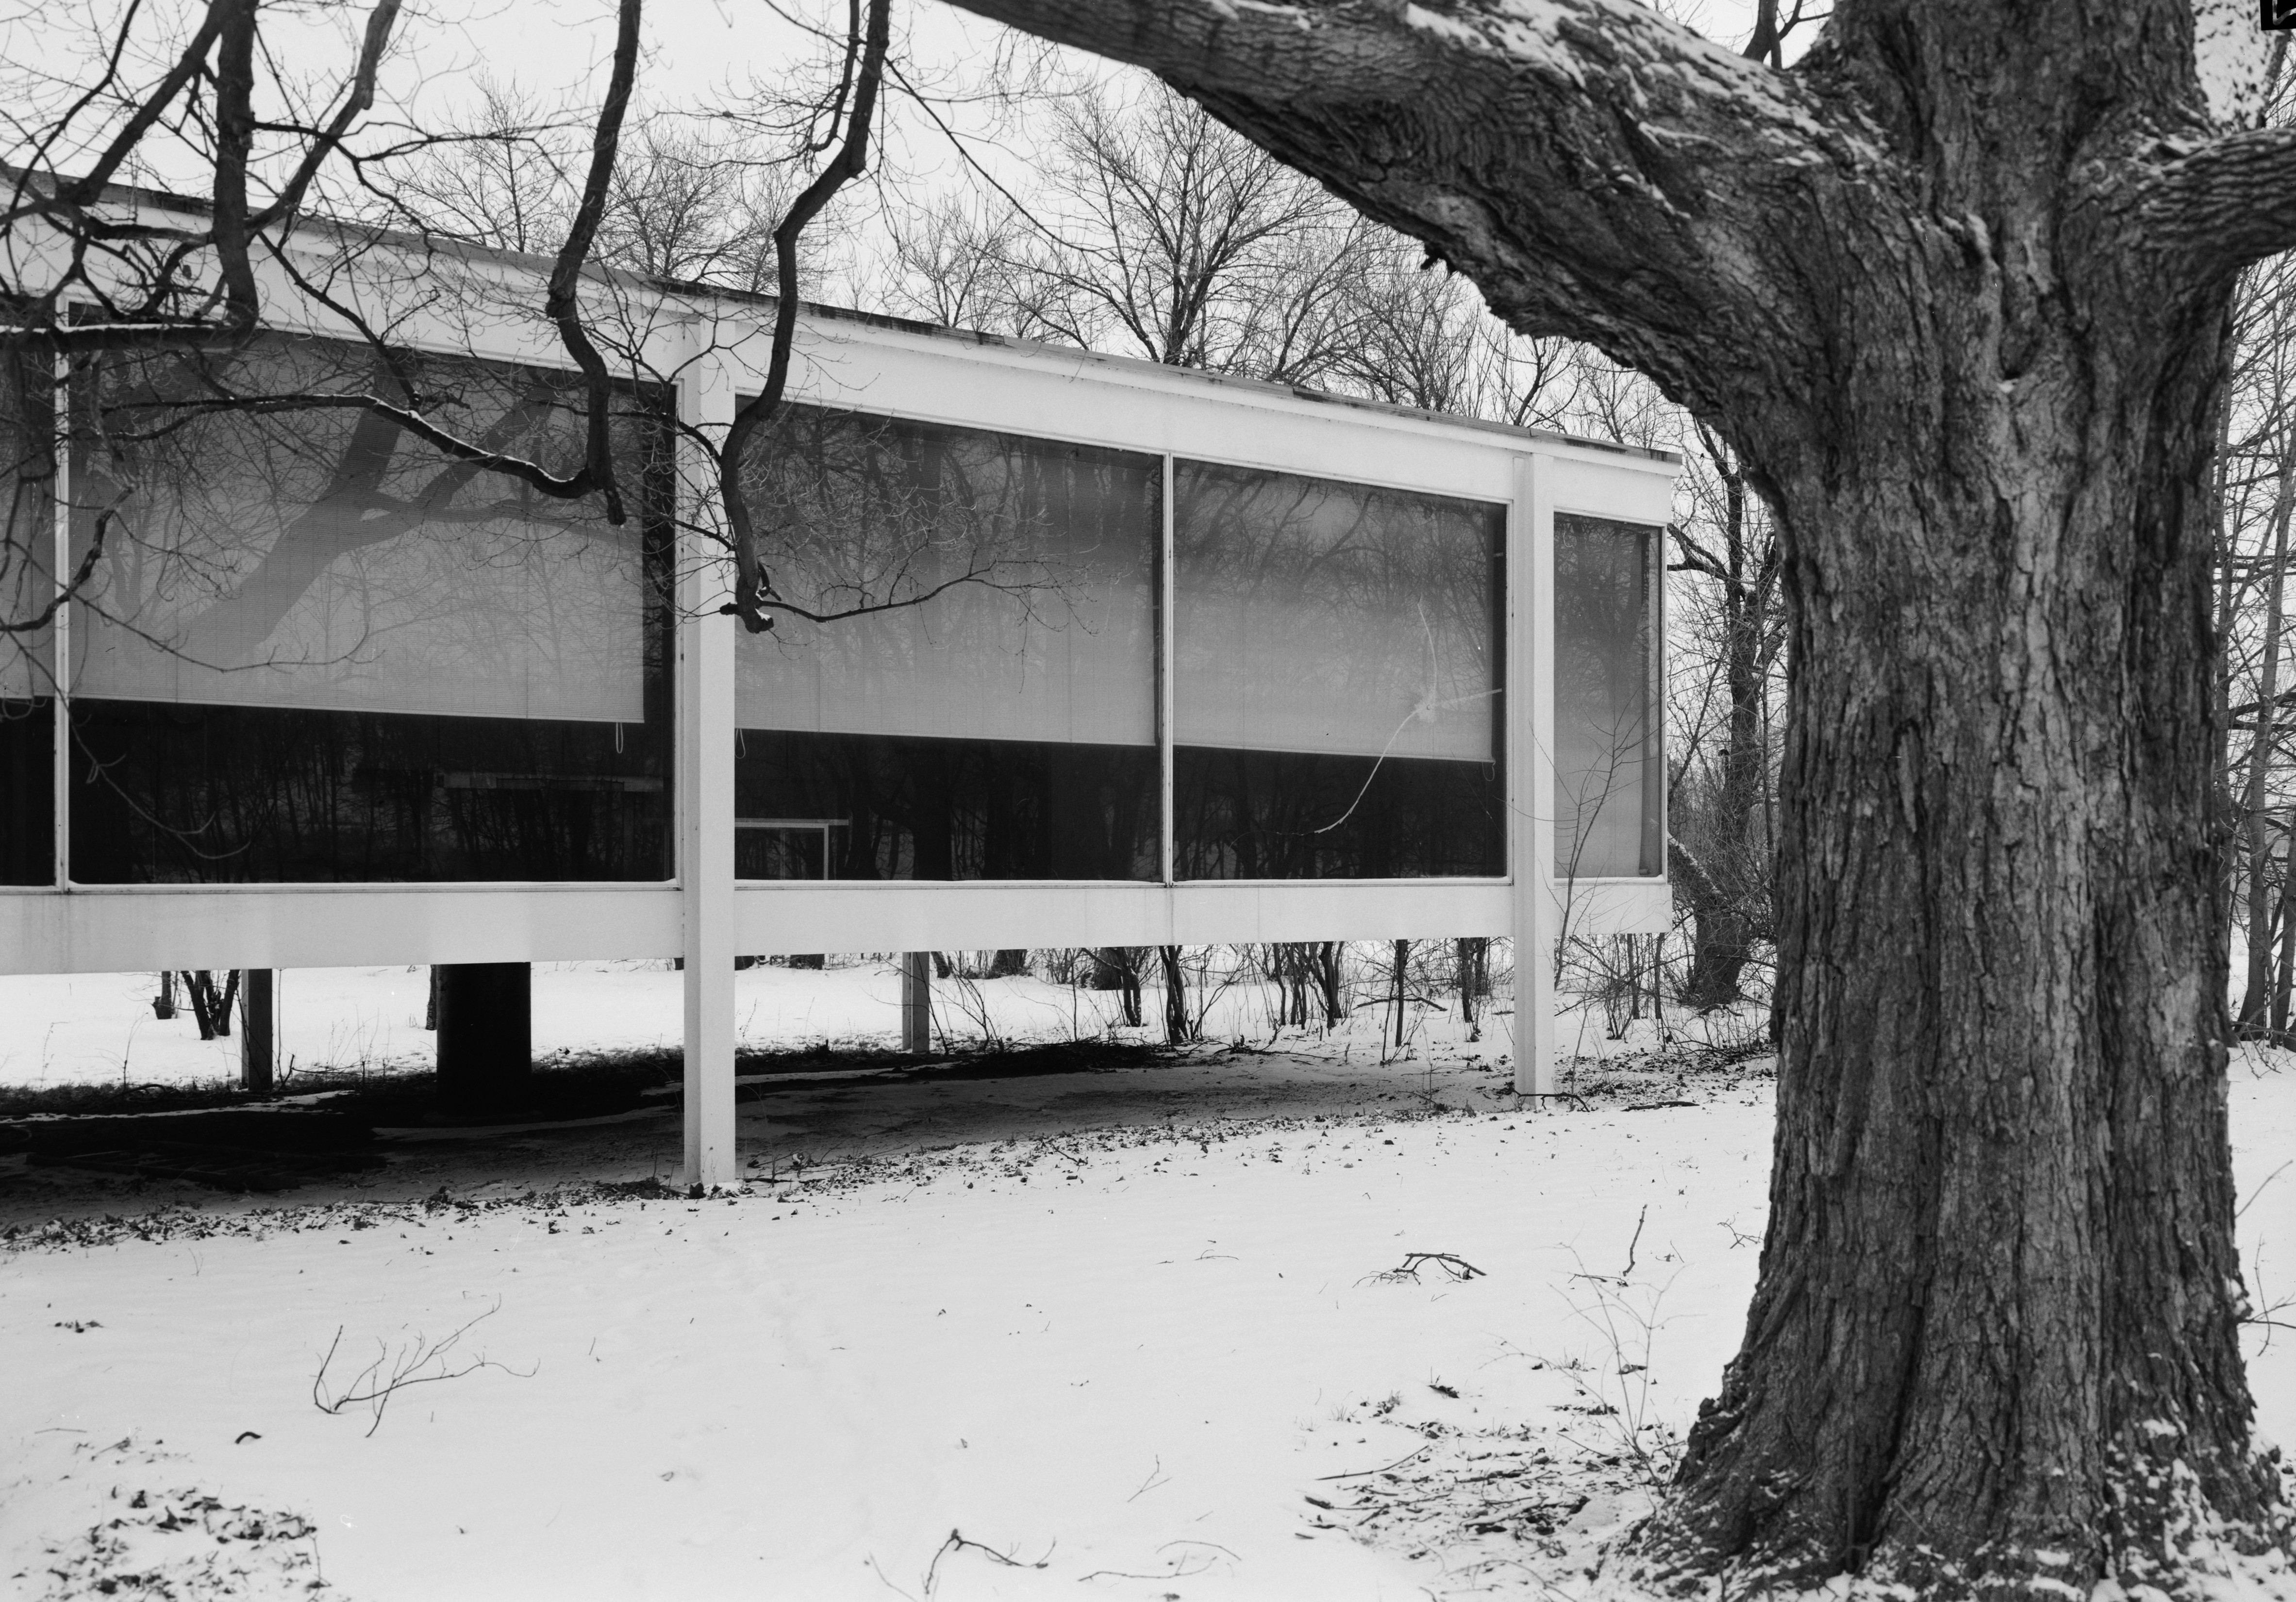 file mies van der rohe photo farnsworth house plano usa wikimedia commons. Black Bedroom Furniture Sets. Home Design Ideas